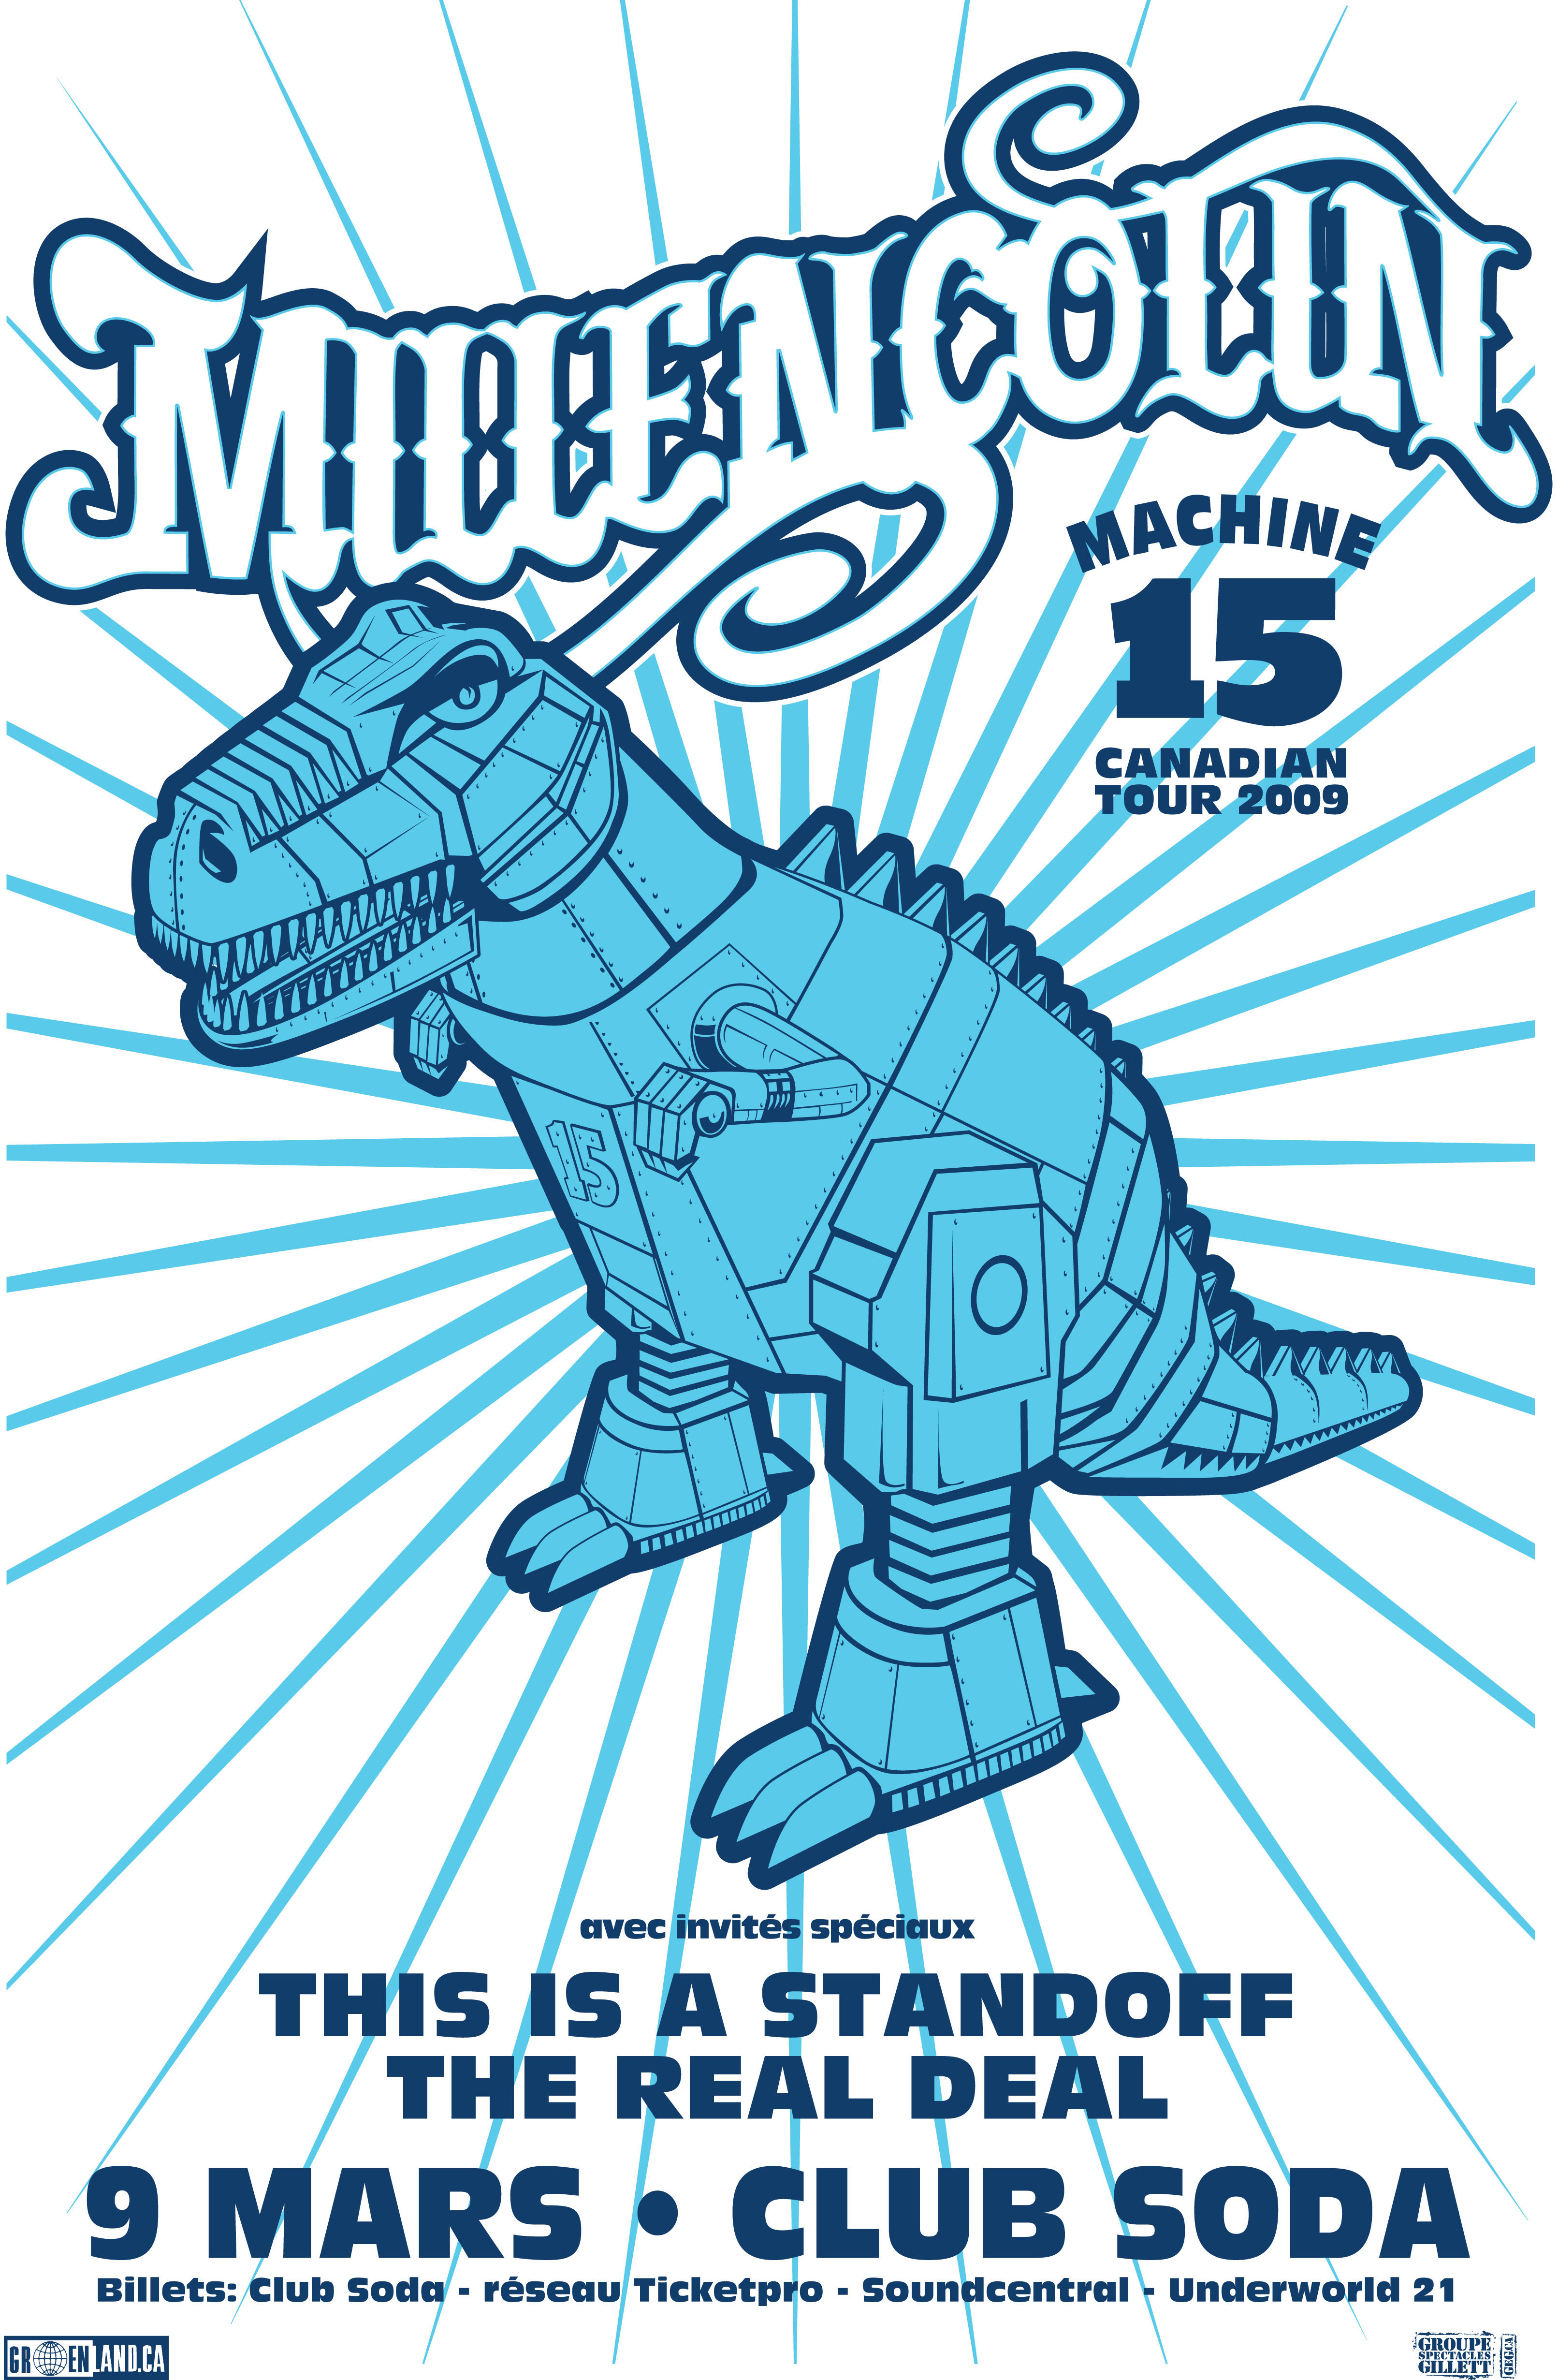 Millencolin_poster(Mar09)